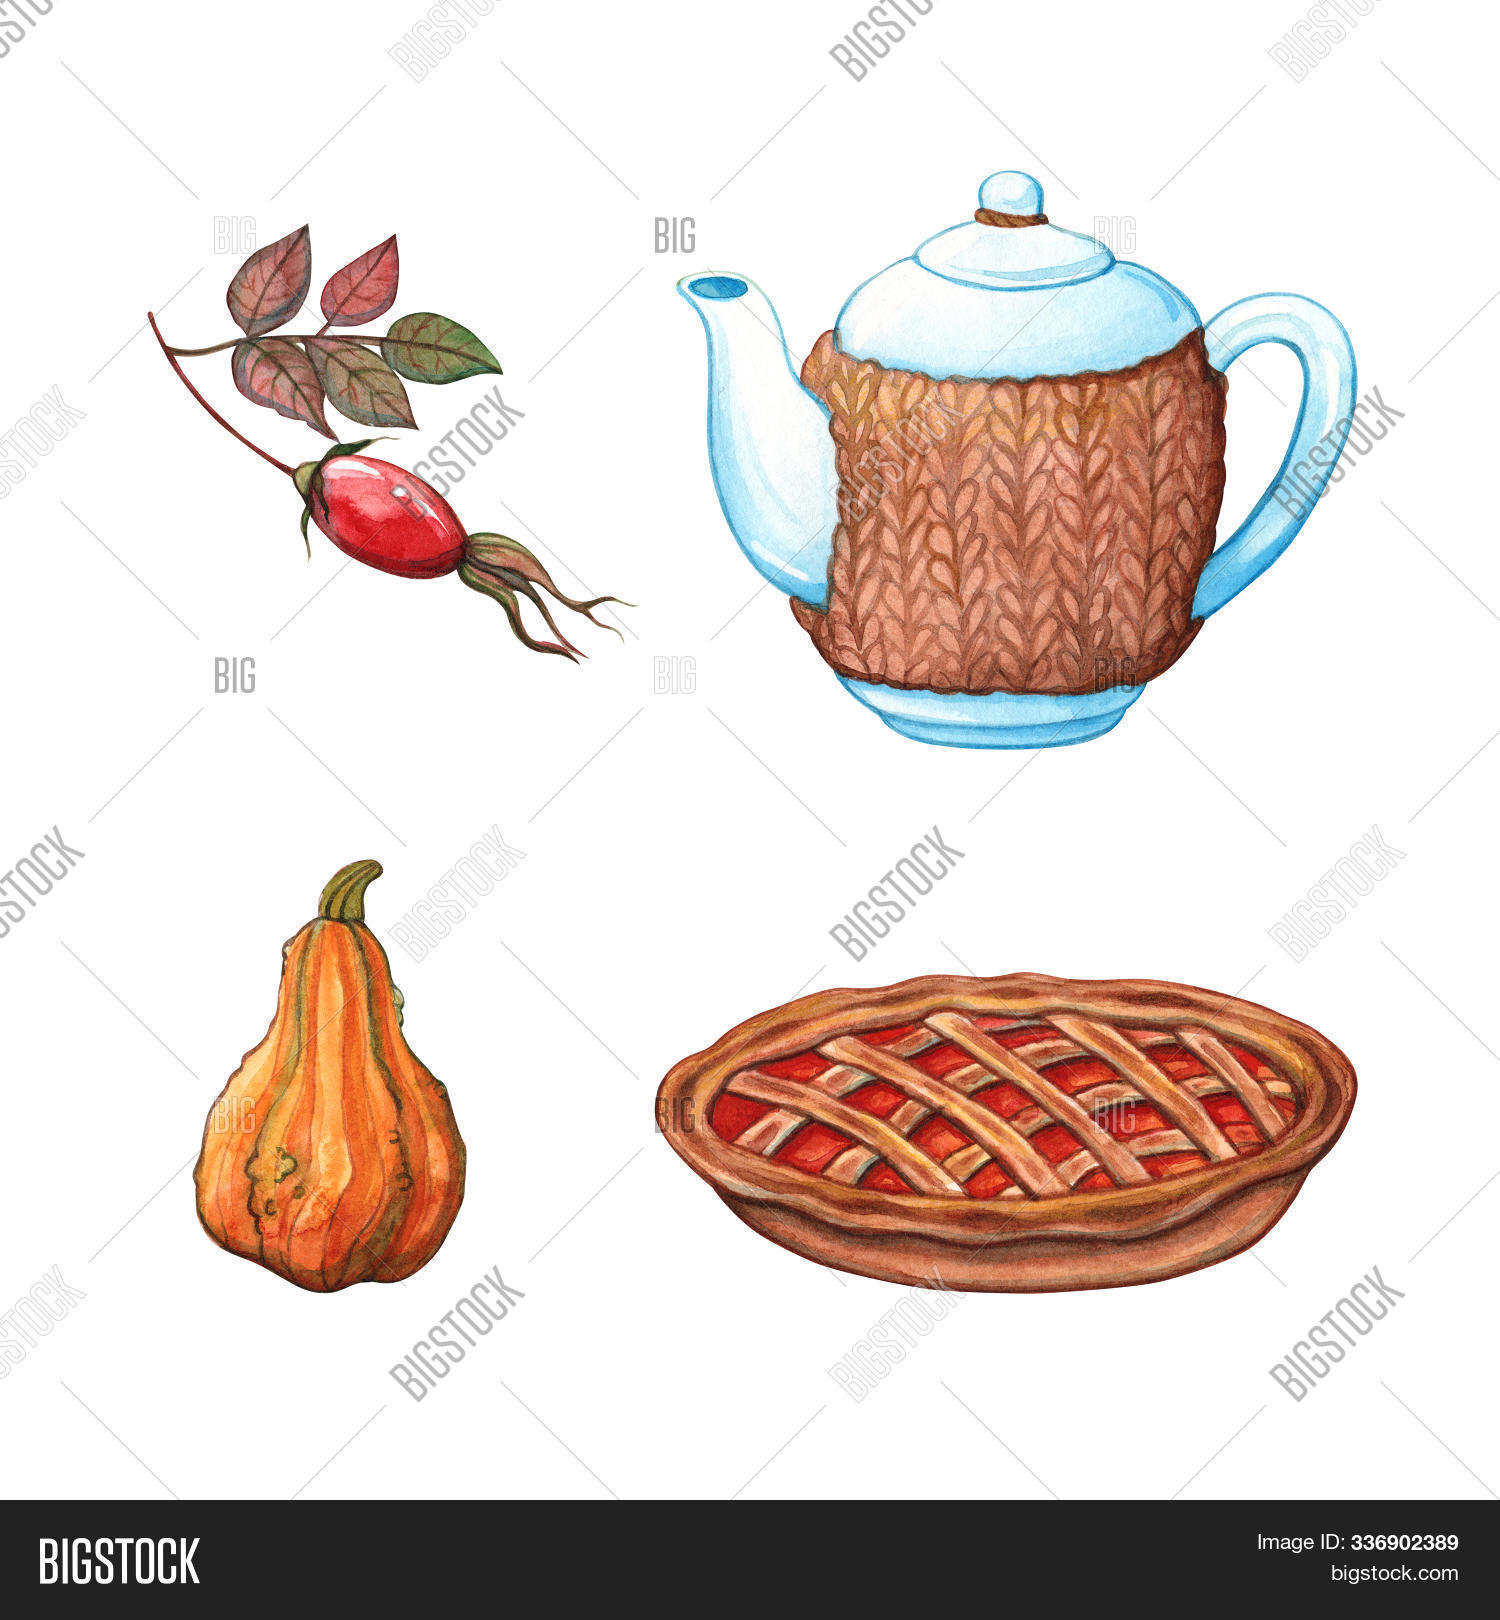 autumn,bake,bakery,berry,beverage,cake,clipart,dessert,dog-rose,drawing,drawn,drink,element,fall,food,hand,herbal,hibiscus,hip,homemade,hot,illustration,isolated,lattice,party,pastry,pie,pot,pumpkin,rose,rosehip,seasonal,set,sweet,tart,tea,teapot,thanksgiving,time,traditional,treat,vegetable,vegetarian,vintage,watercolor,white